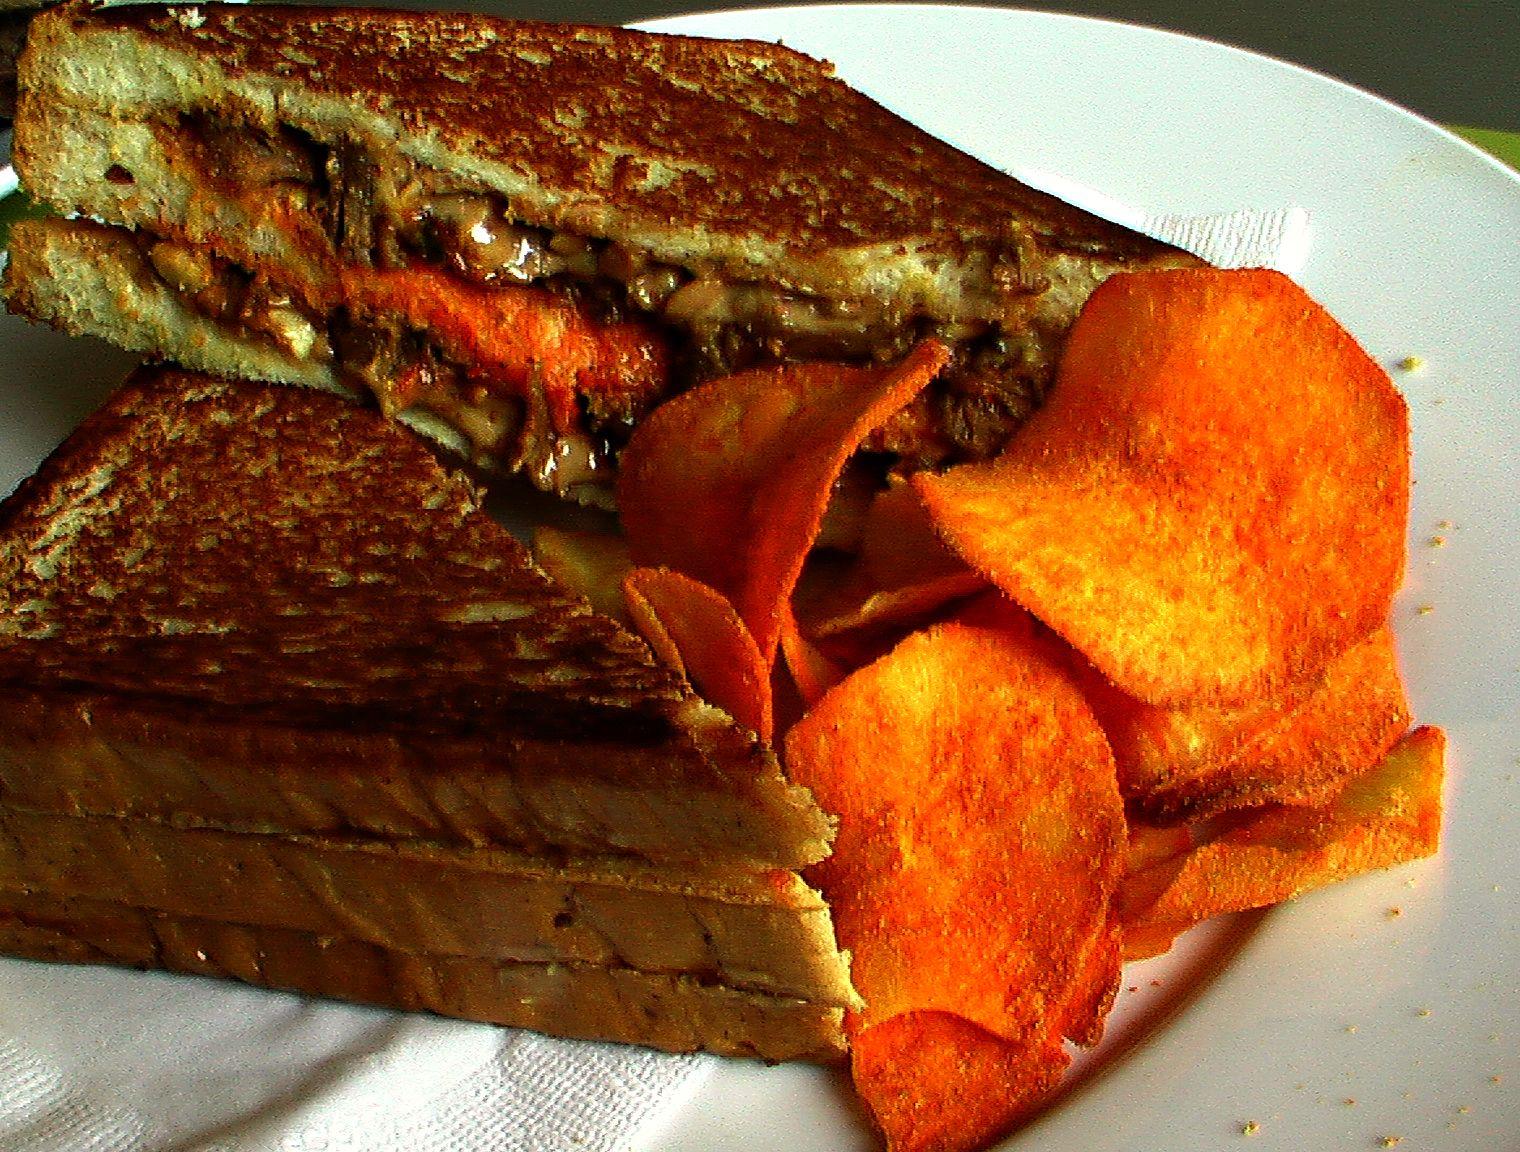 An interesting Peanut Butter & Beef Rendang Sandwich served at The KopiShop. Hmmm ...